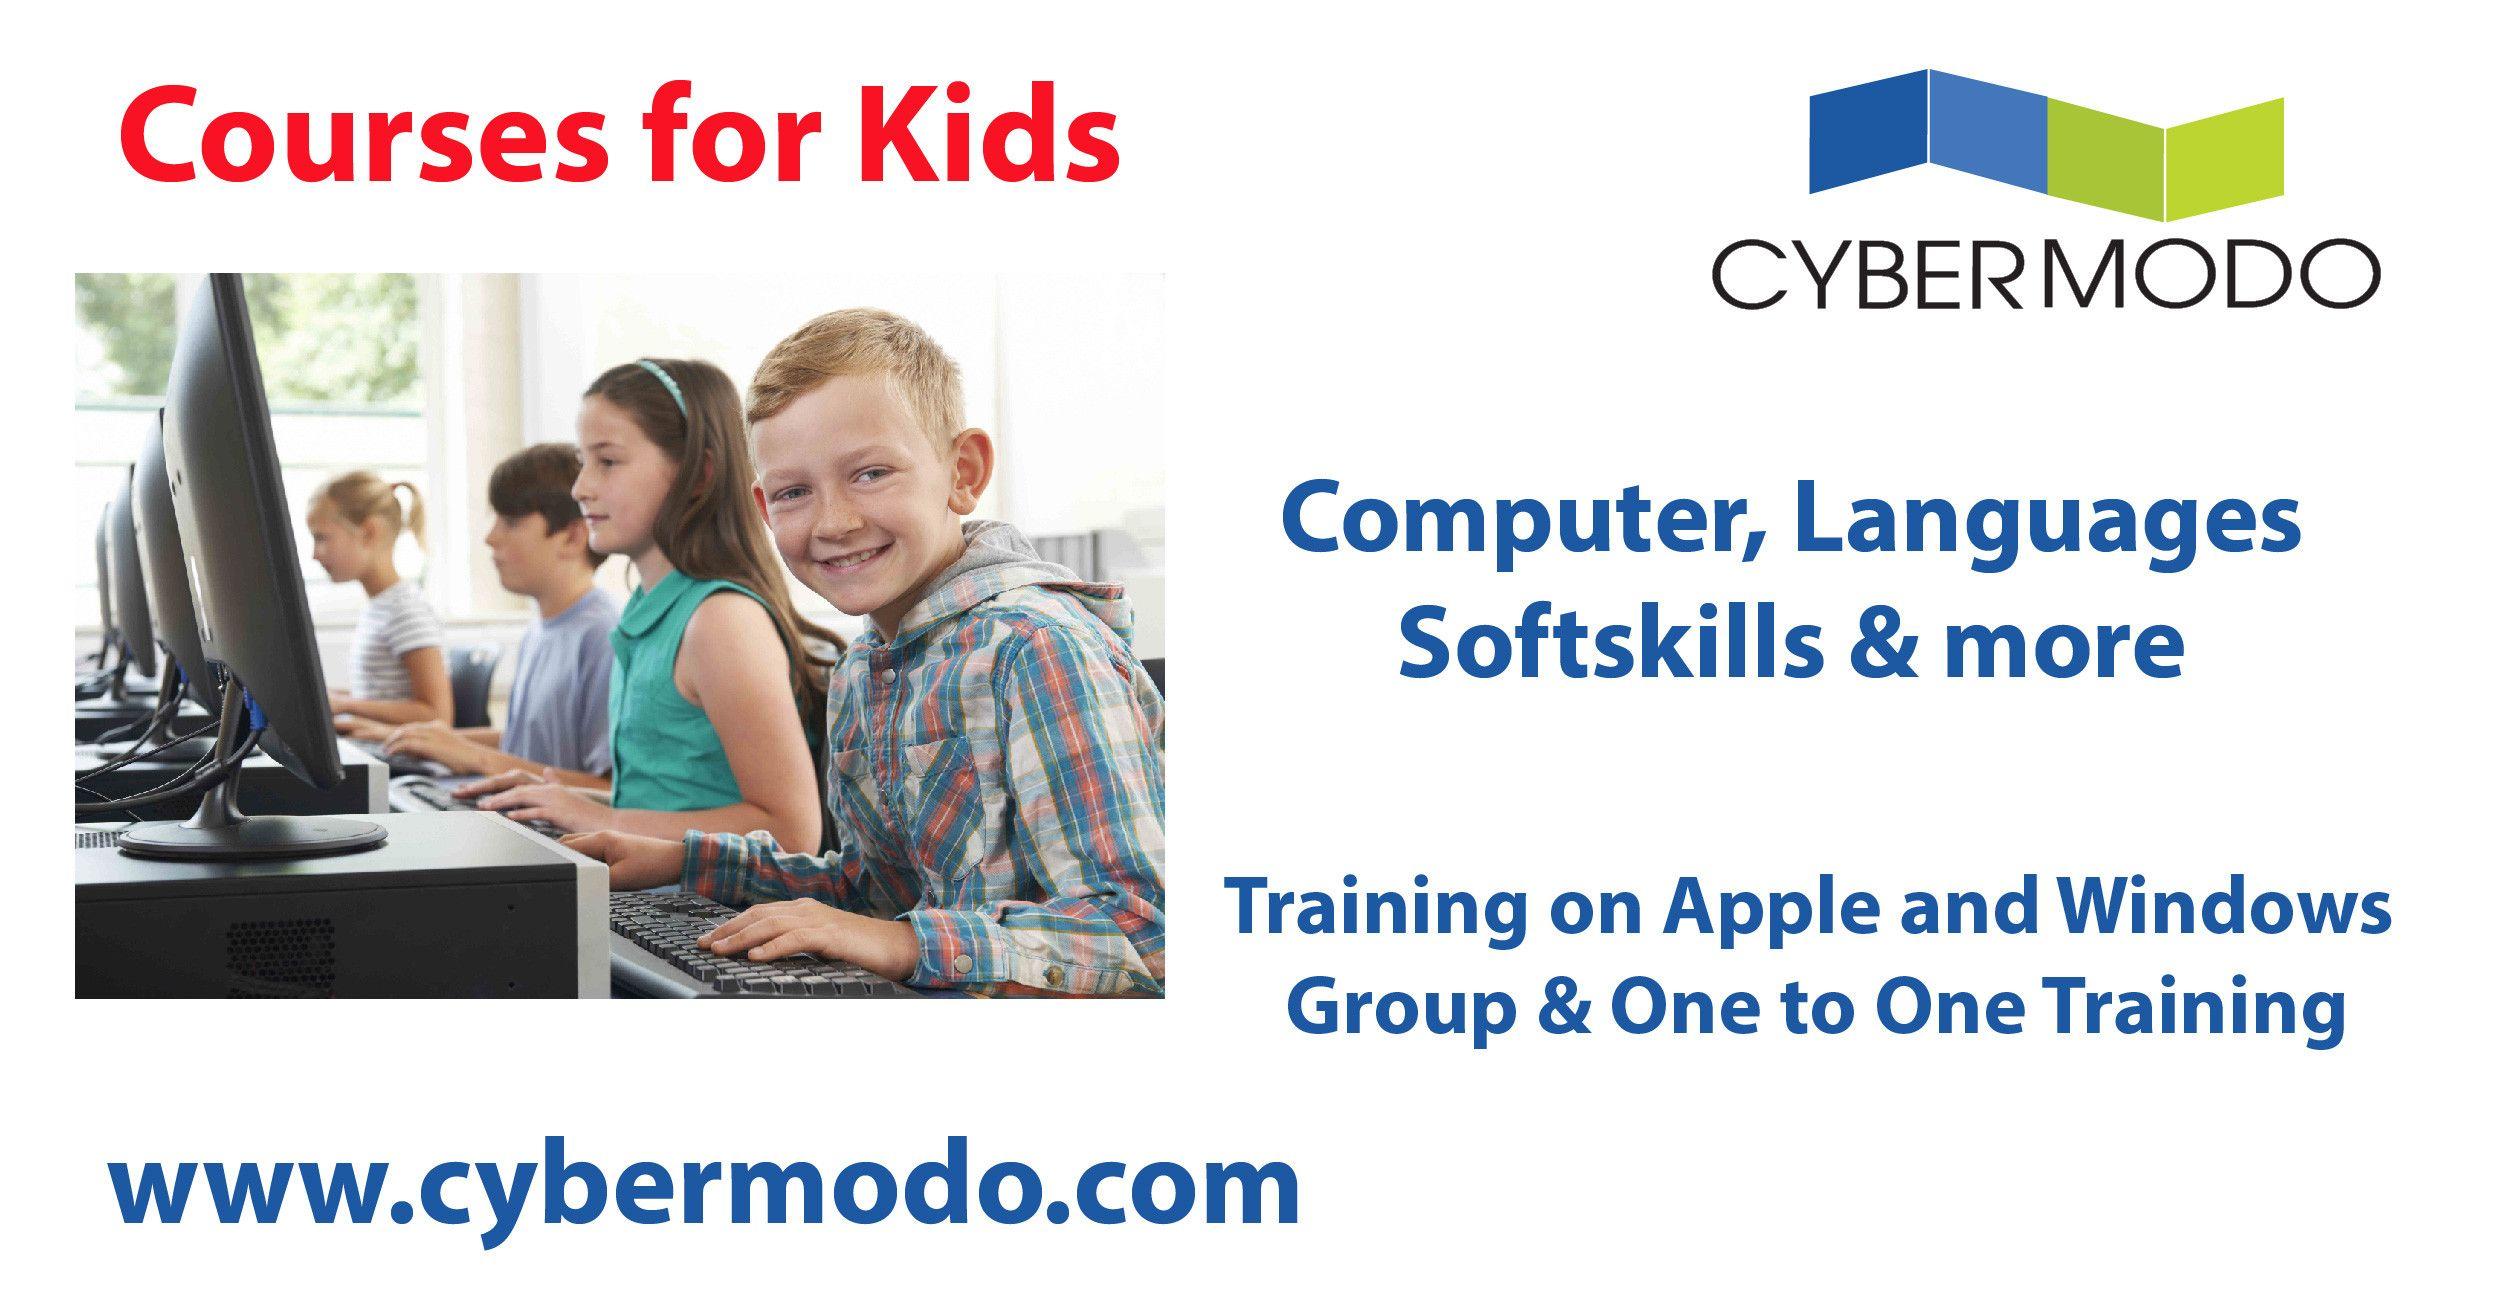 Cyber Modo Solutions 2